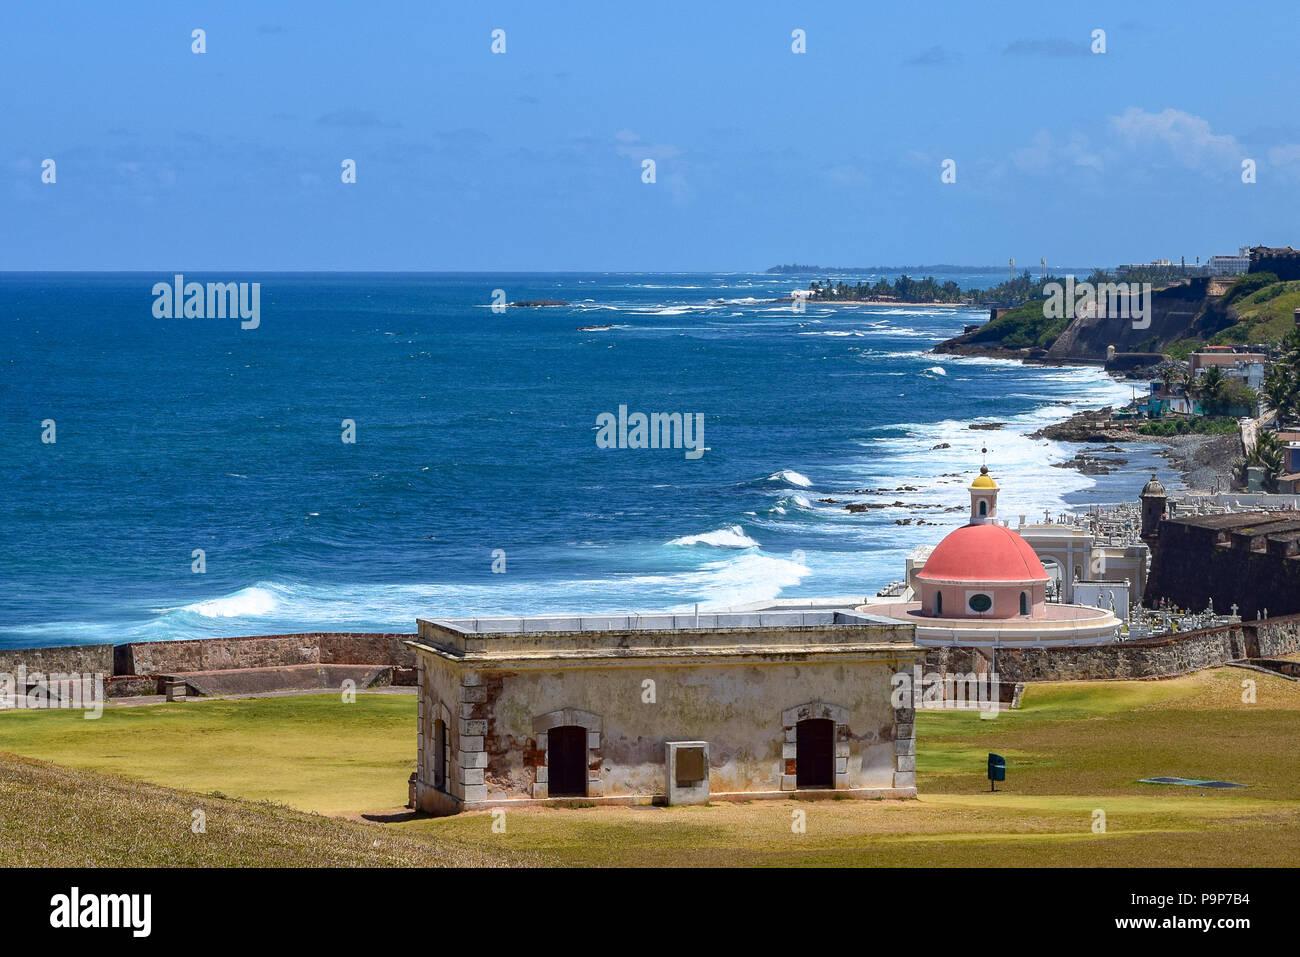 San Juan, Puerto Rico - April 02 2014: Coastline view in Old San Juan overlooking Santa Maria Magdalena de Pazzis Cemetery, which is next to Fort San - Stock Image